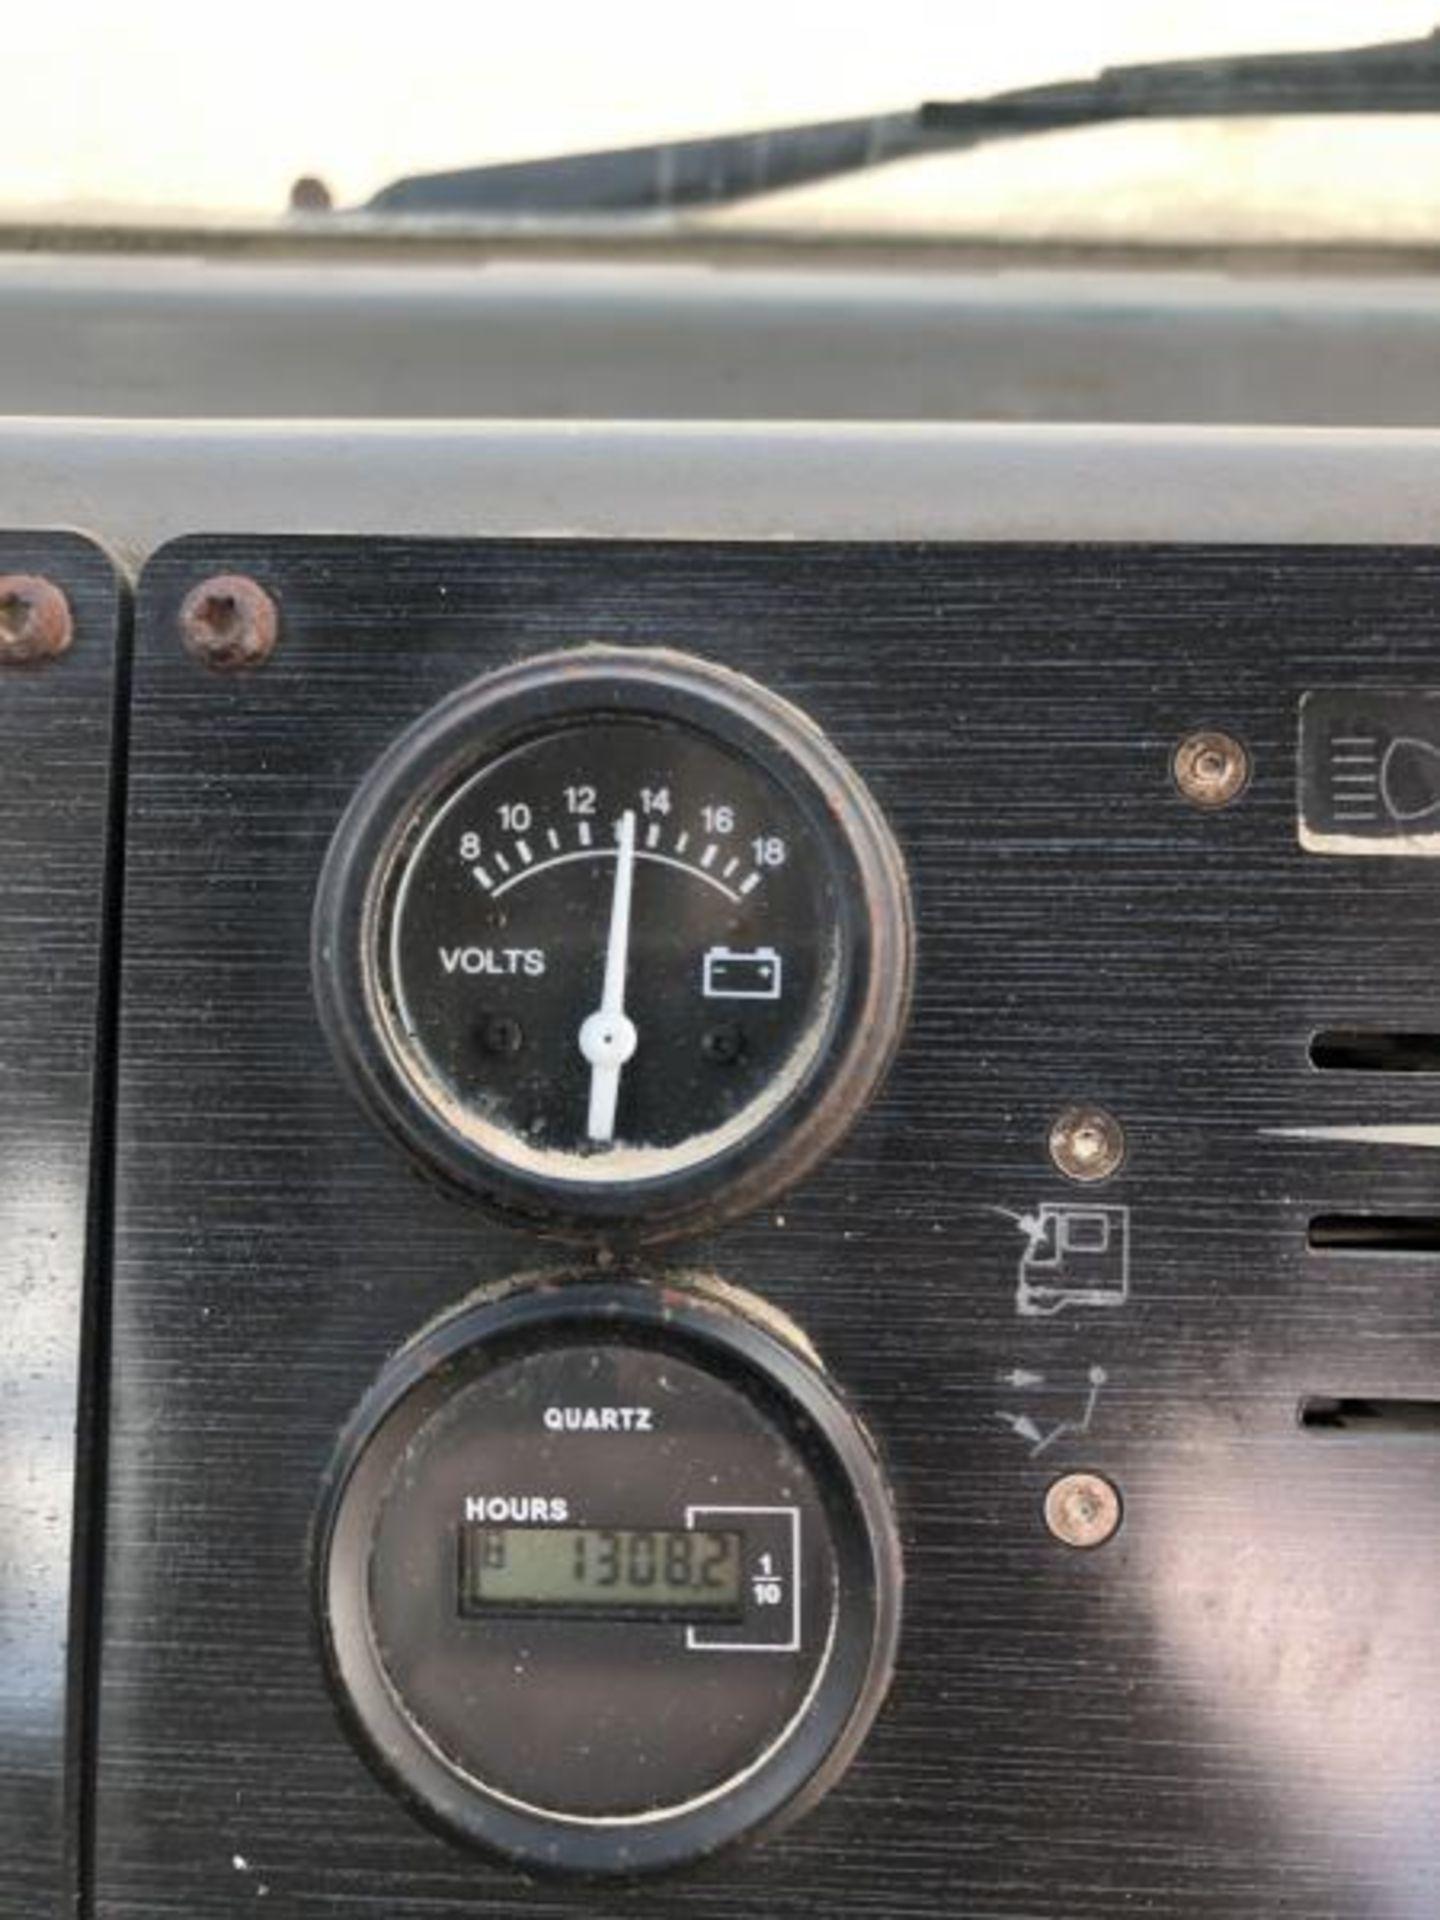 2015 Kalmar Ottawa 4x2 Yard Truck , SN: 338842 1,308.2 Hours, 937 Miles - Image 18 of 27